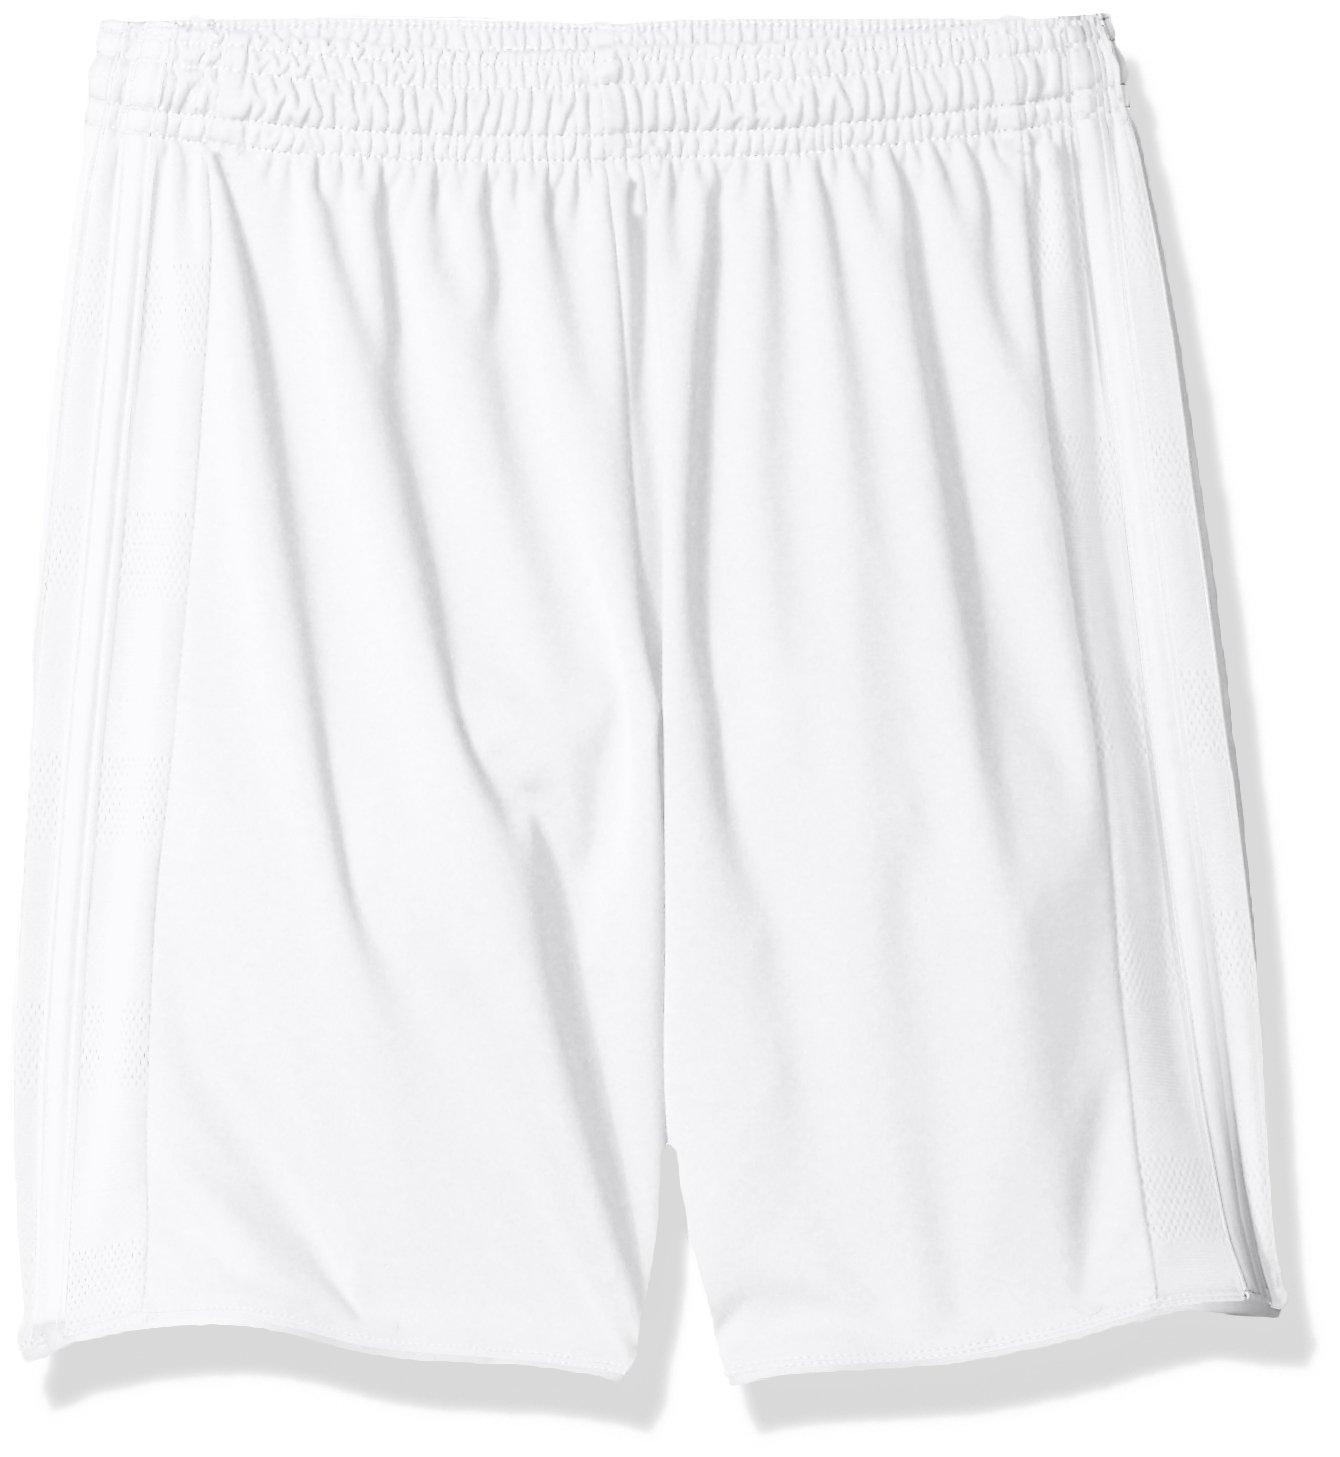 Adidas ユースサッカー Tastigo ショーツ B01HNB862W X-Small|ホワイト/ホワイト ホワイト/ホワイト X-Small